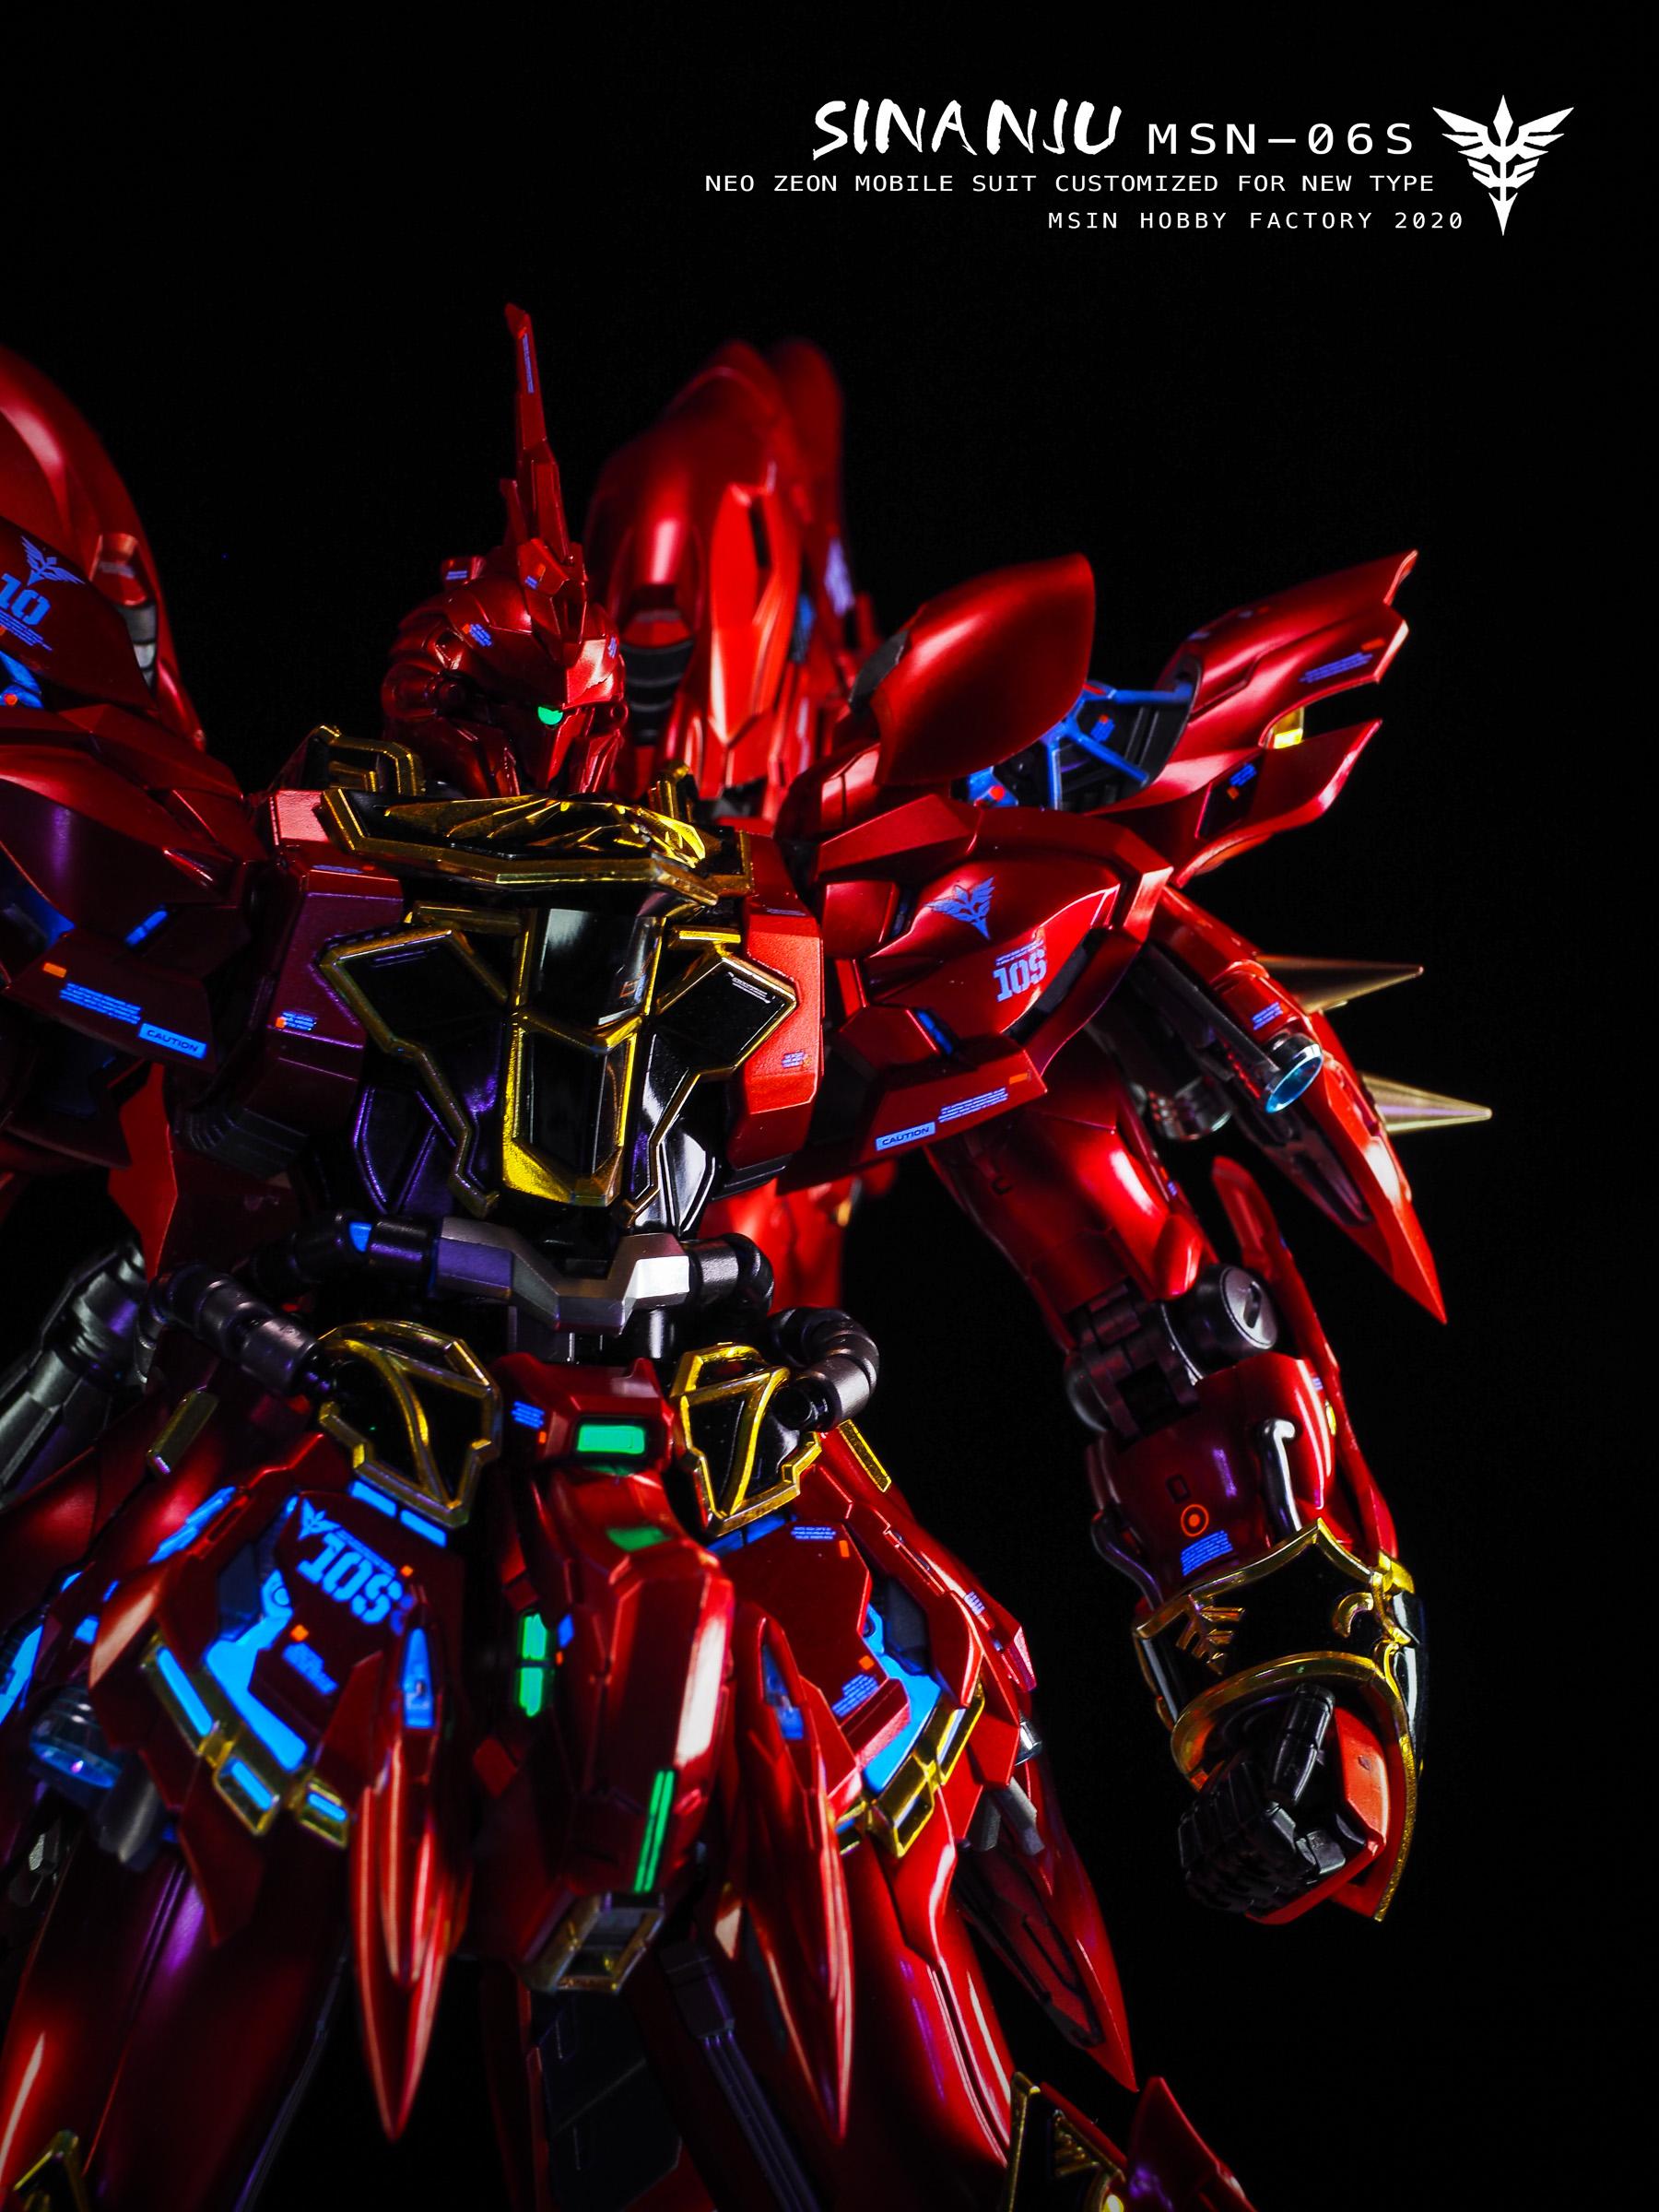 S437_6_takumi_sinanju_red_011.jpg